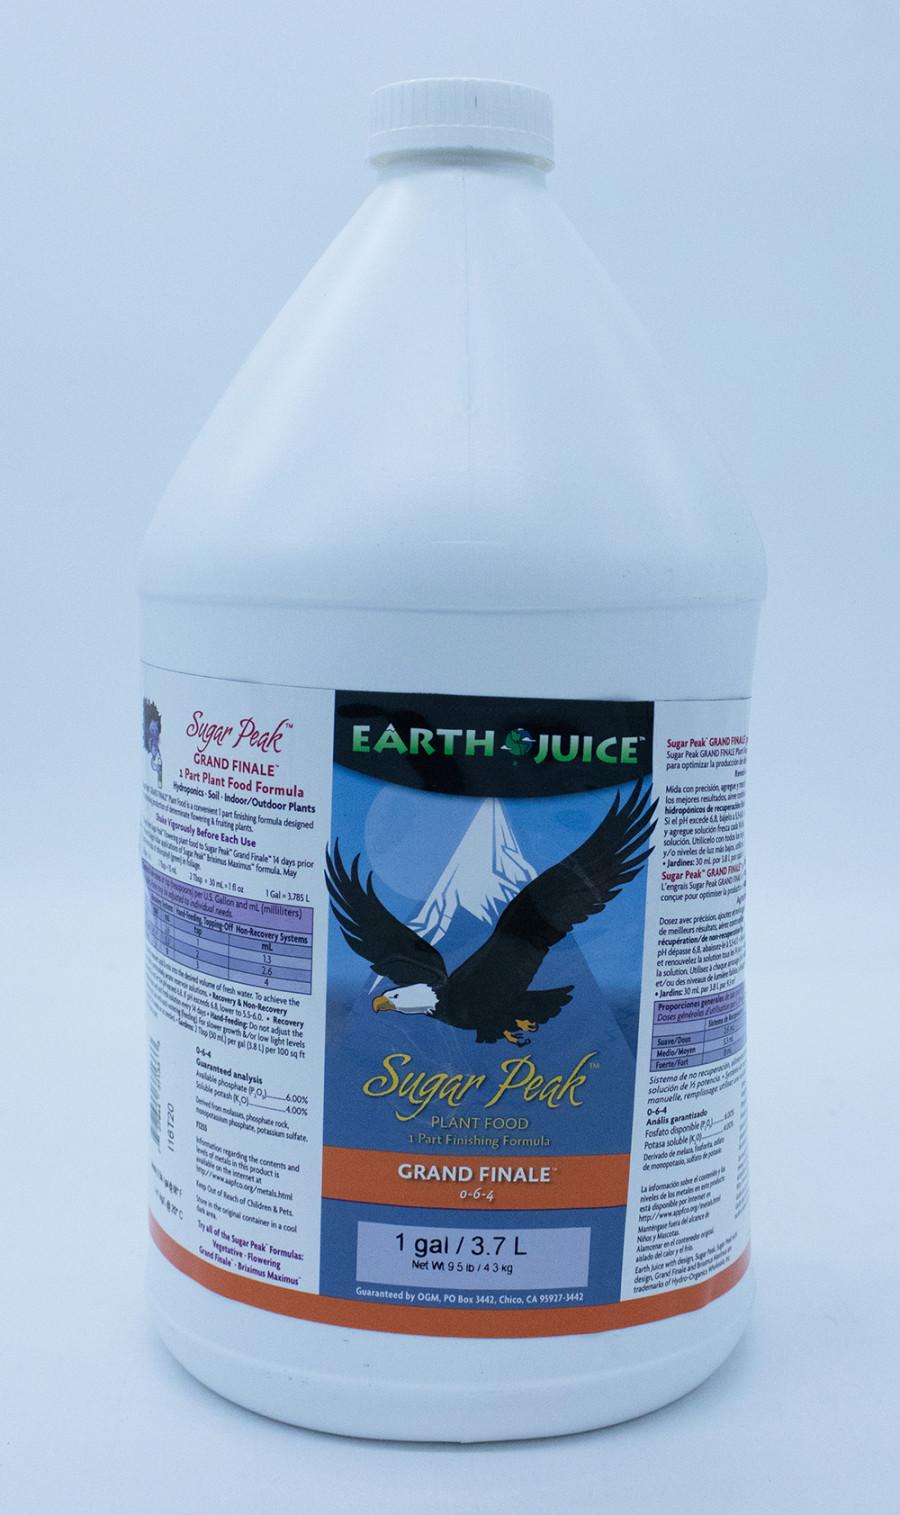 Earth Juice Sugar Peak Grand Finale 0-6-4 Plant Food 4ea/1 gal